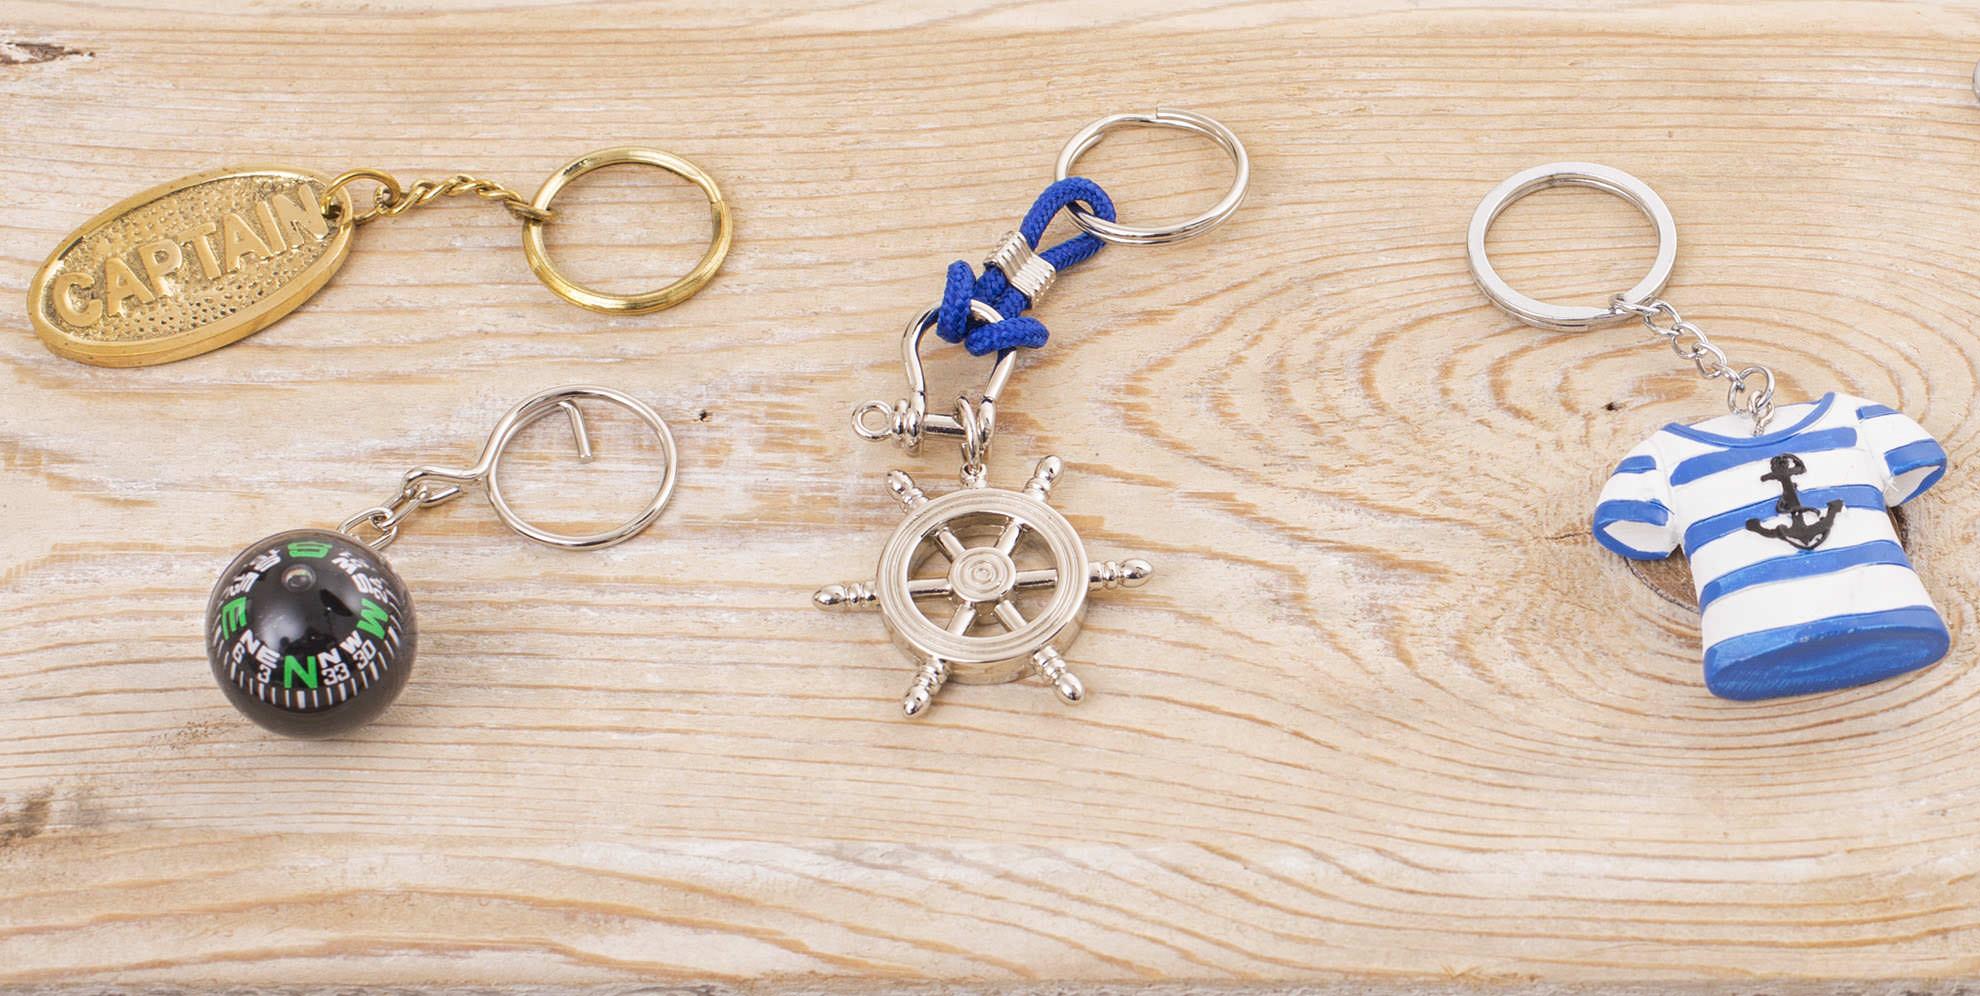 Schlüsselanhänger » online kaufen   mare-me   mare-me. Maritime ... c7b68a037e